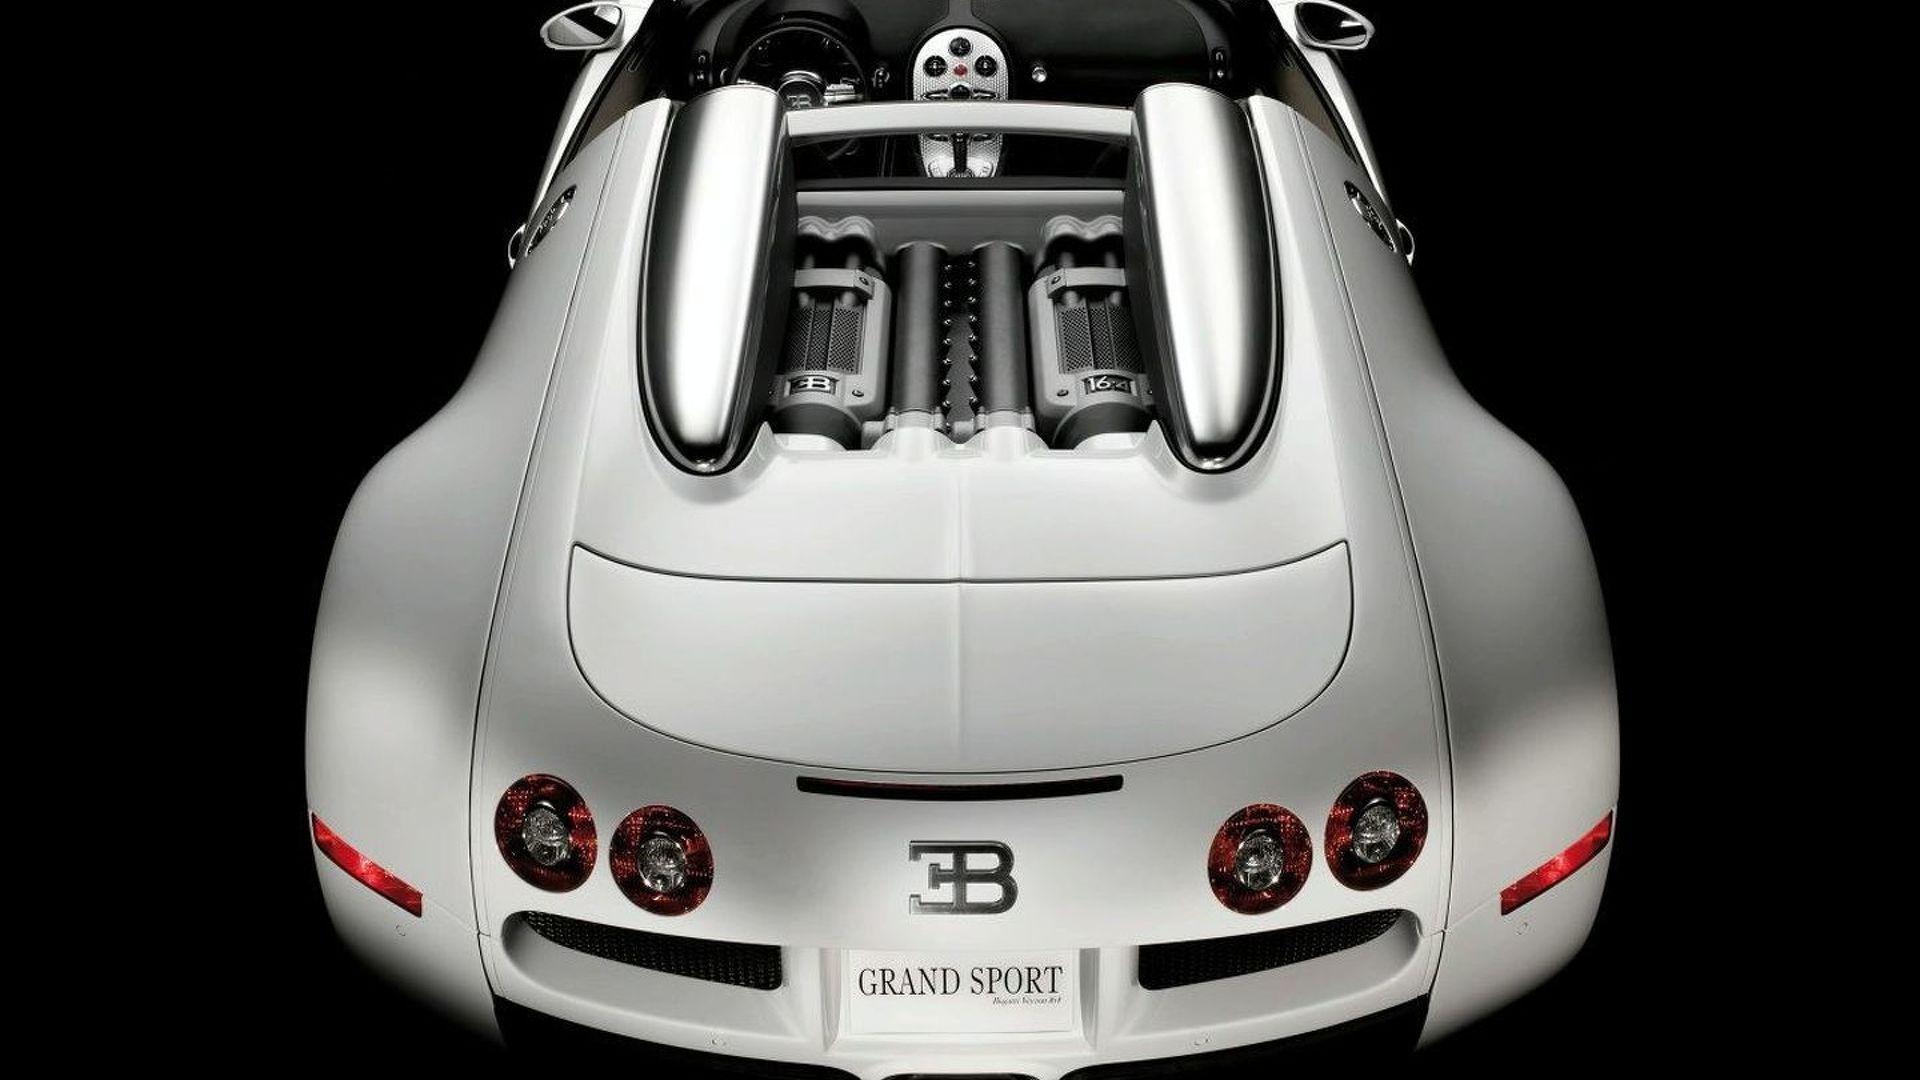 Bugatti Veyron 16.4 Grand Sport Roadster Revealed